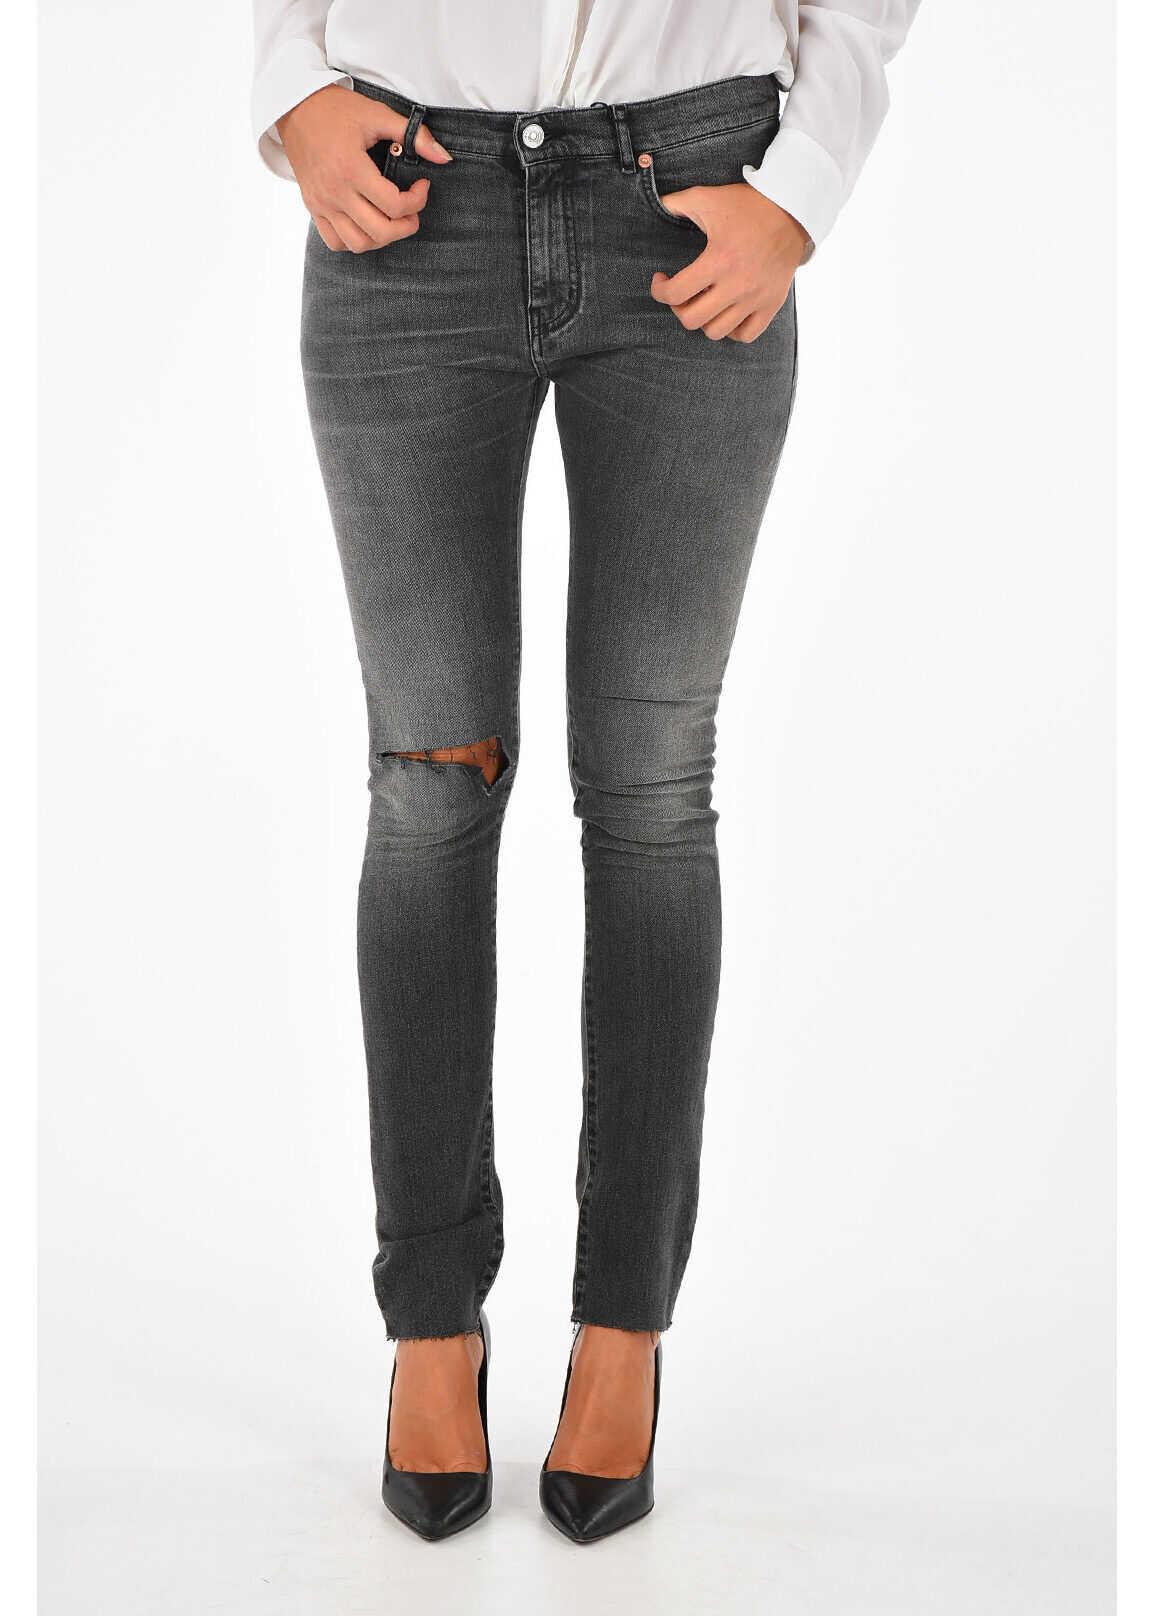 Balenciaga 13,5cm Distressed Denim Jeans GRAY